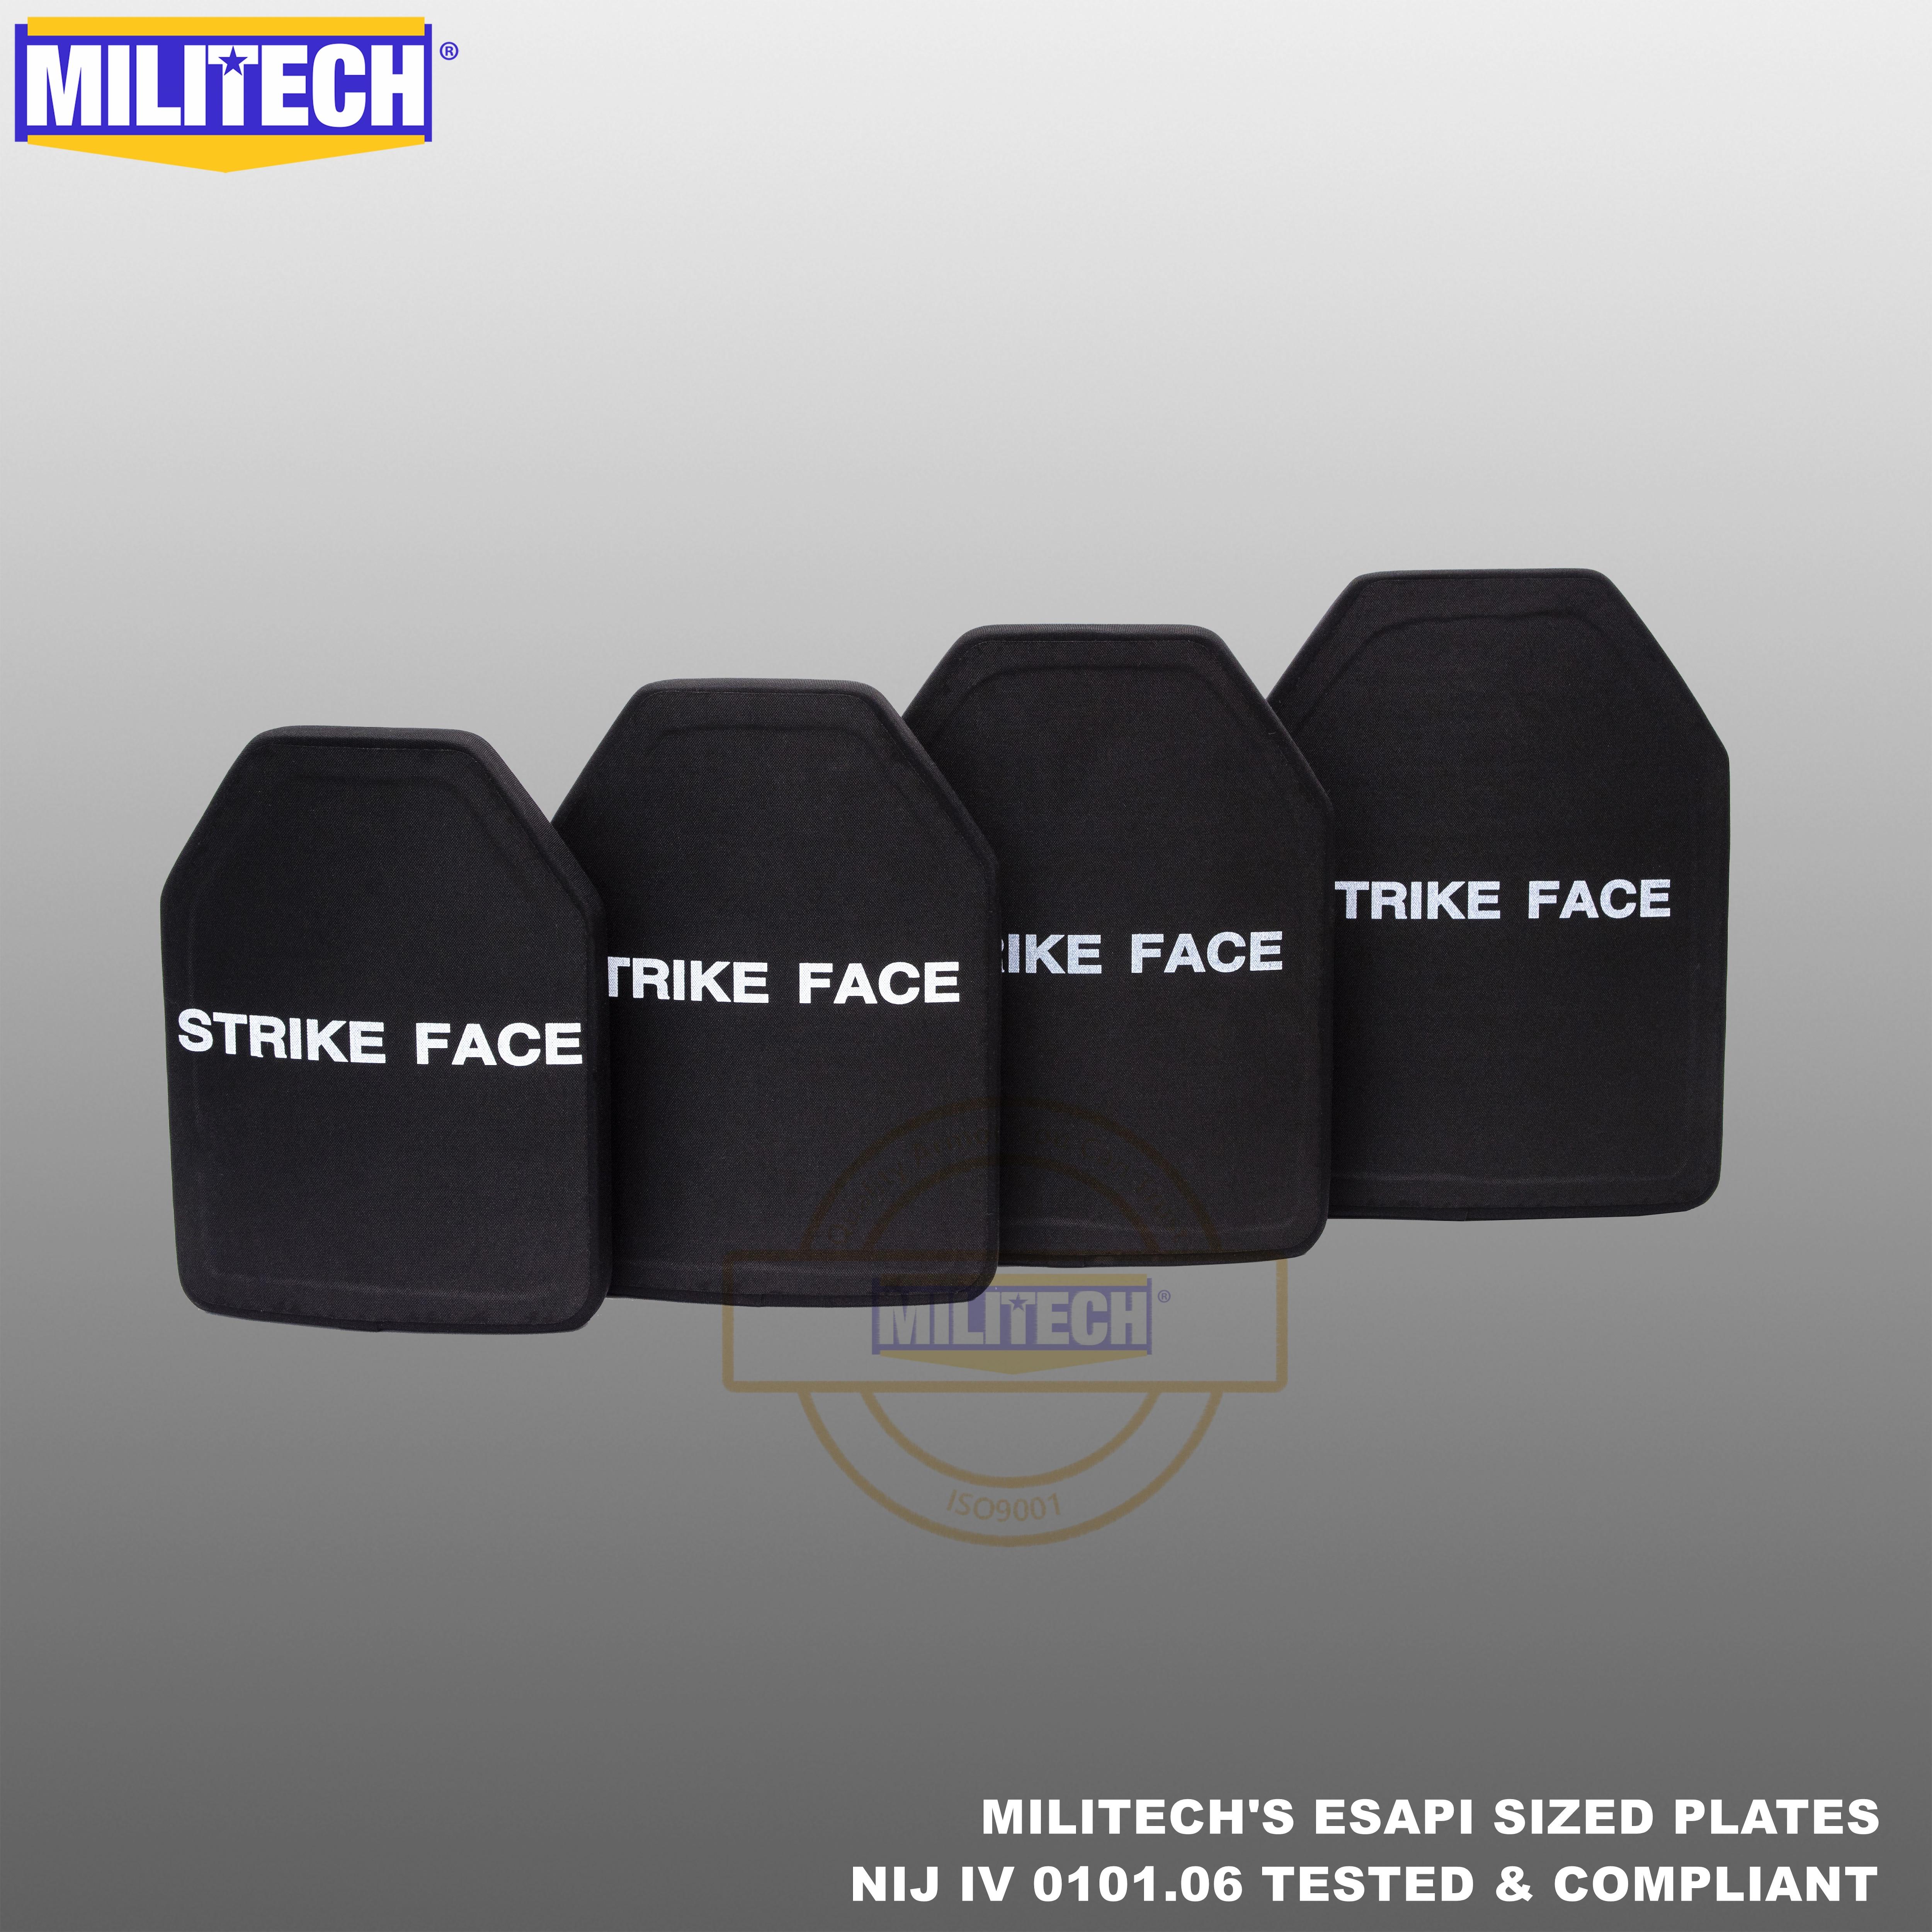 ESAPI Bulletproof Plate Ballistic Panel NIJ level 4 IV Alumina  amp  PE Stand Alone From Size S to XL Body Armor One 1  PC--Militech